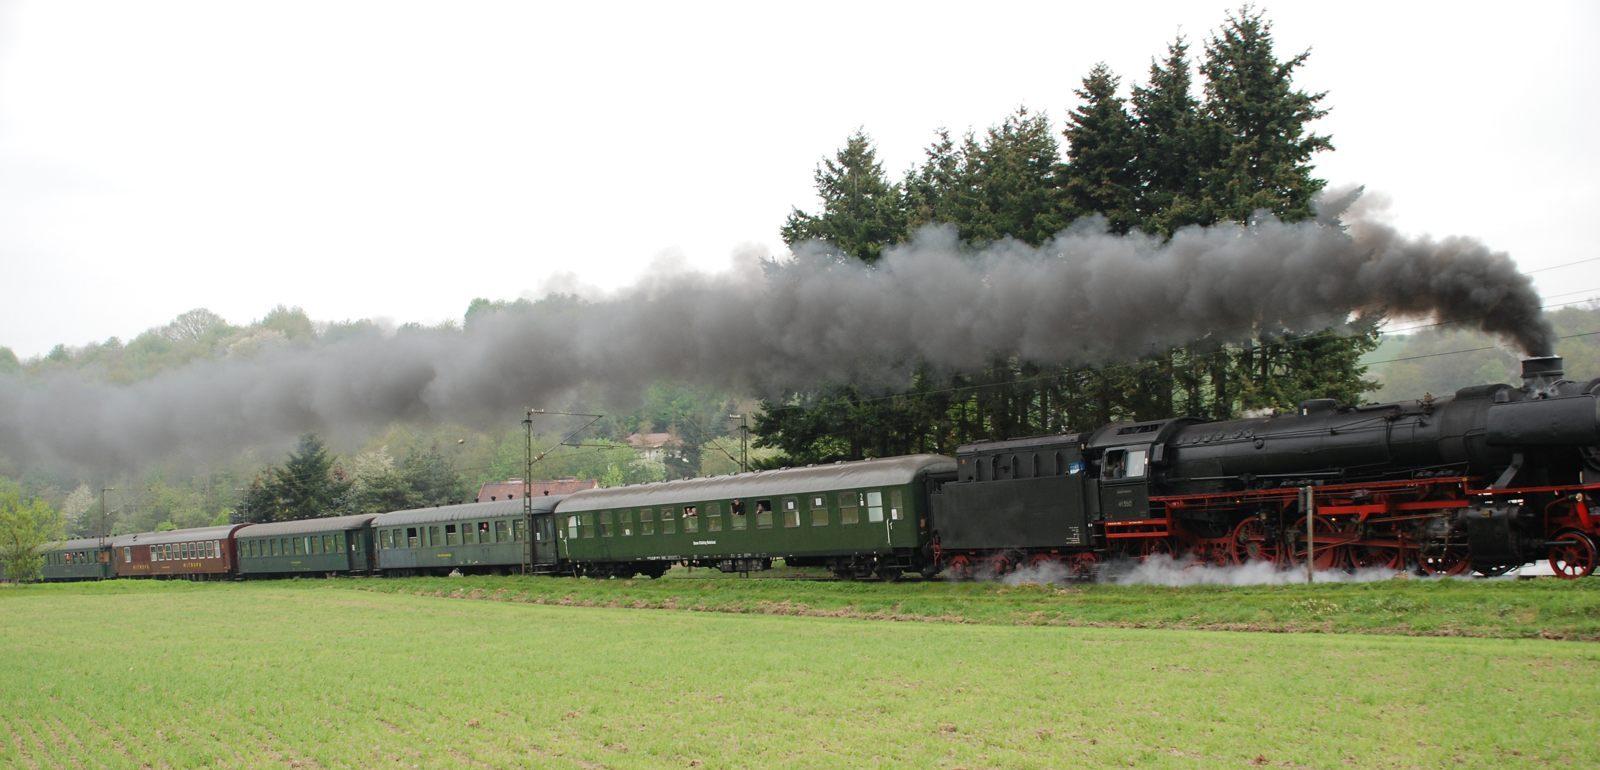 2010Bebra01_1600